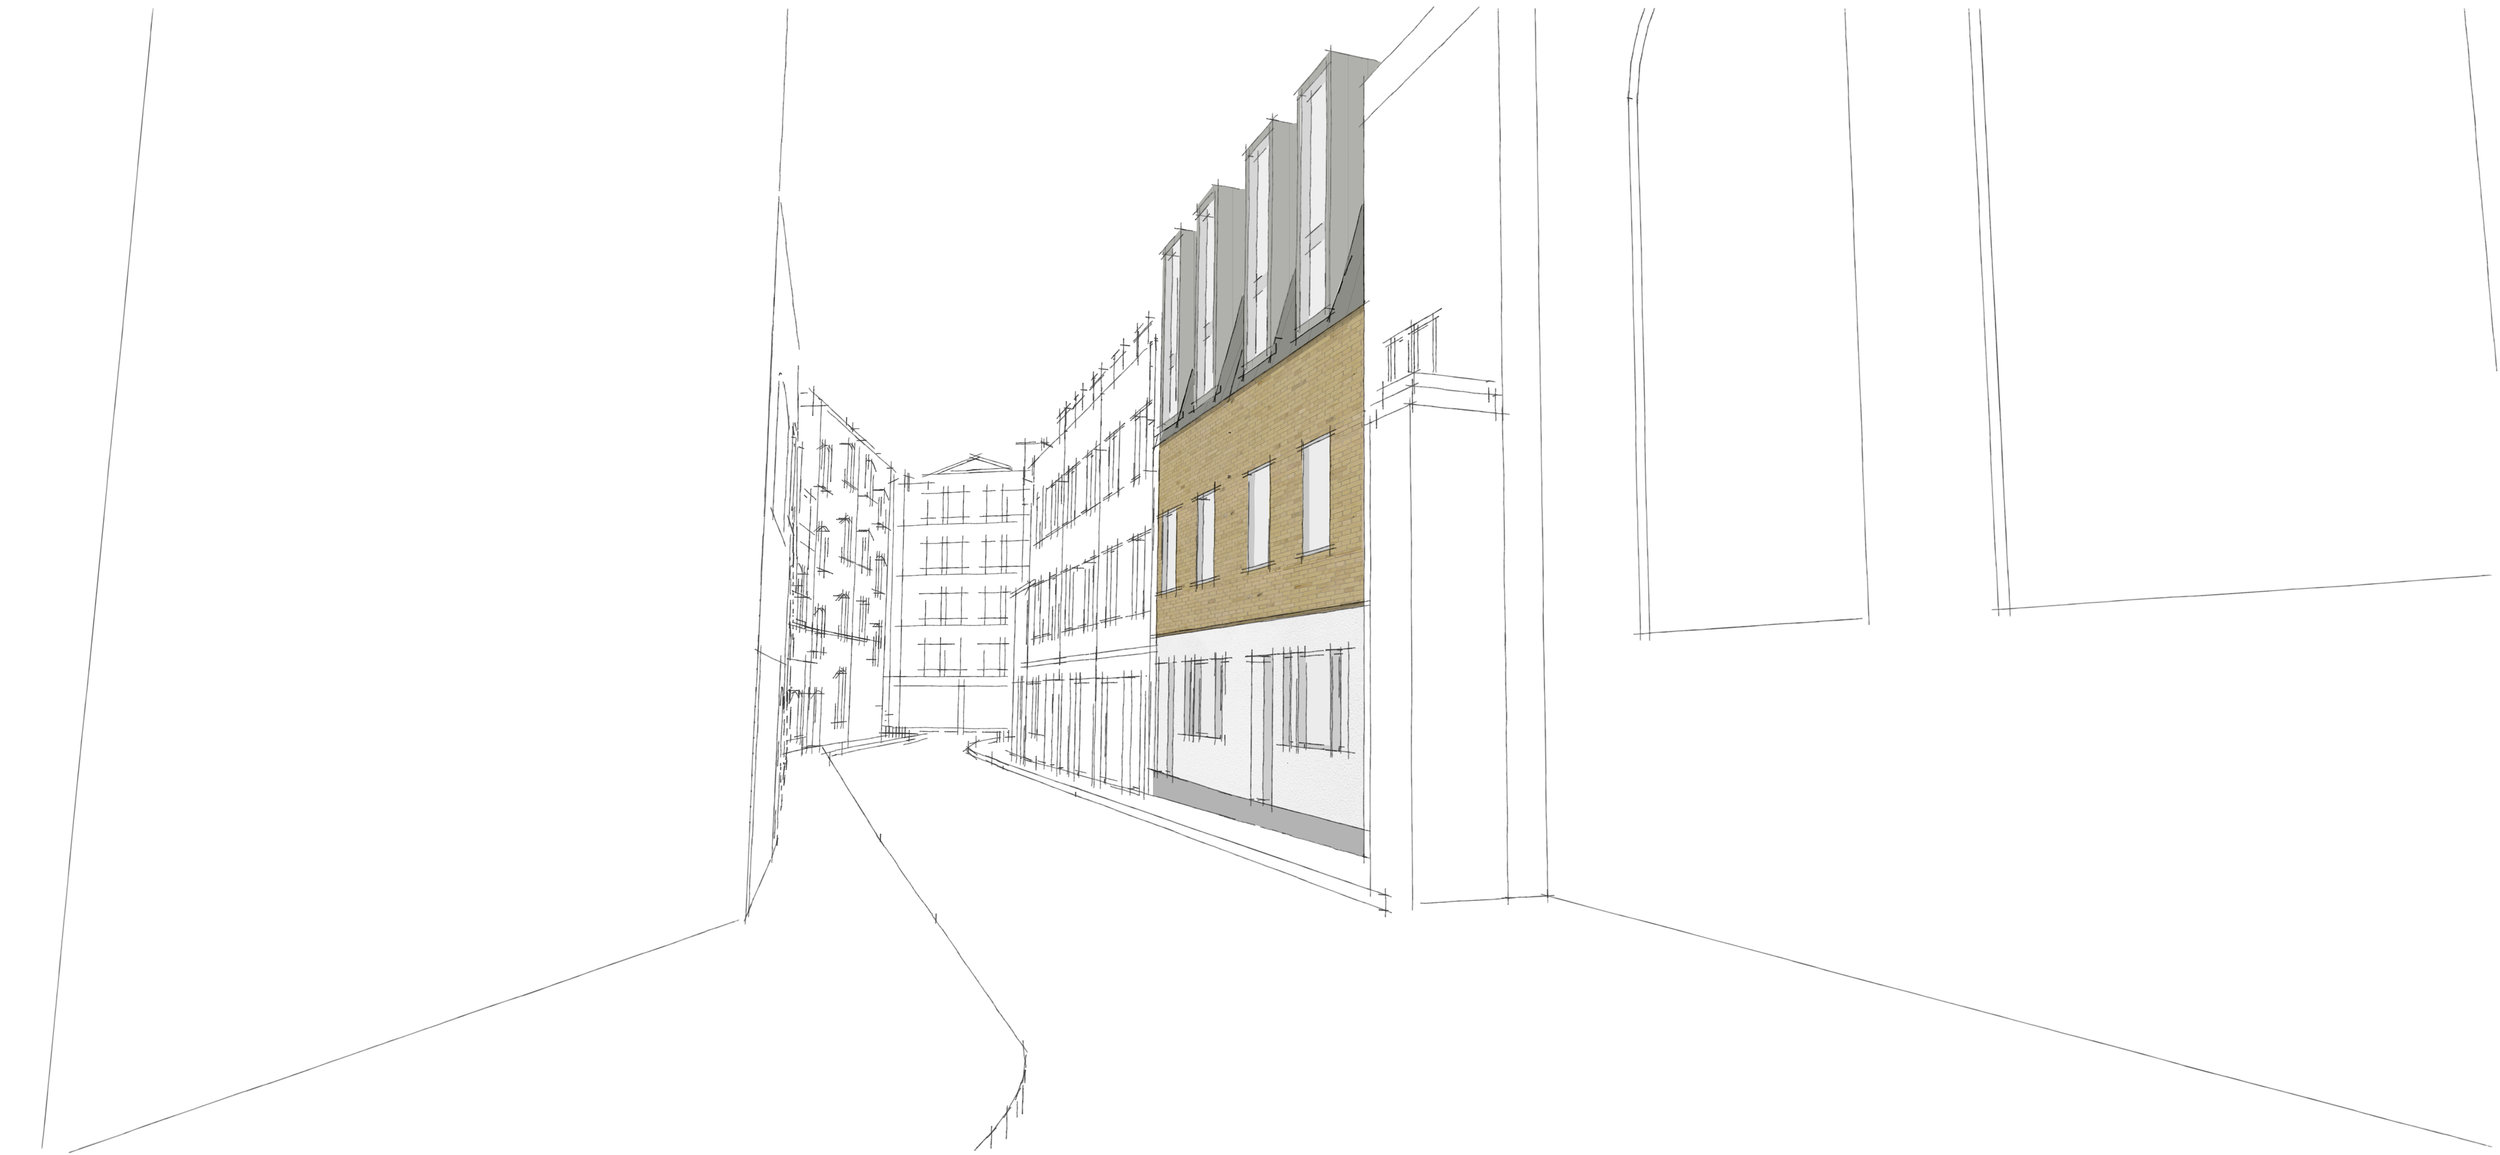 Street 2 - Option 2 - Colour.jpg